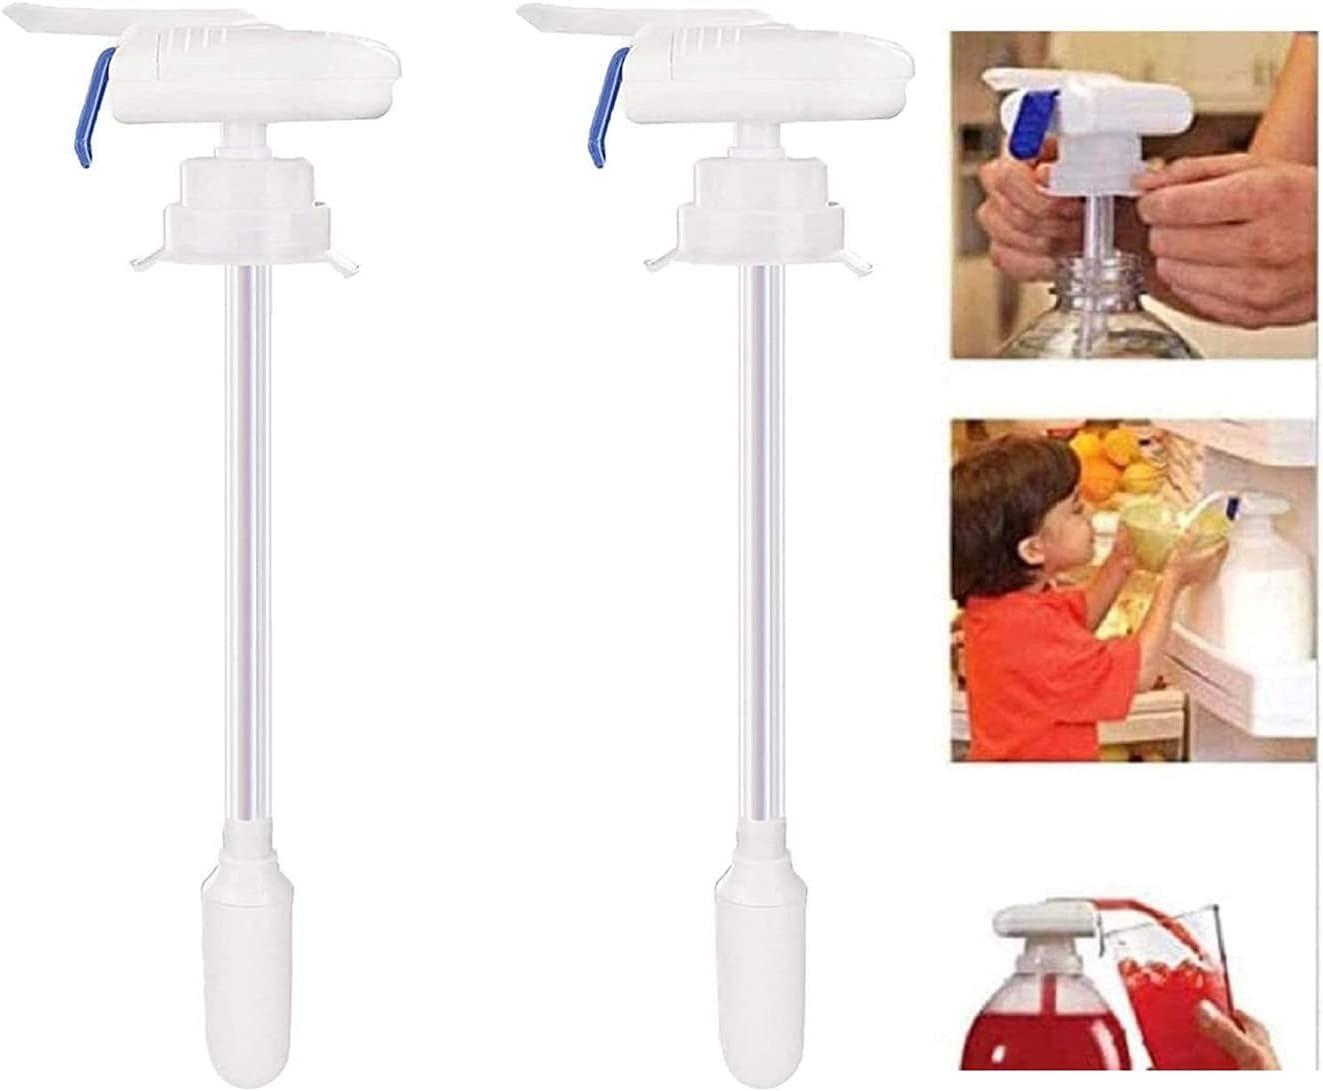 Magic Tap Electric Automatic Water & Drink Dispenser, Magic Electric Tap, Refrigerator Automatic Beverage Dispenser, for Milk Juice Beer Beverage Bottle (2PCS)